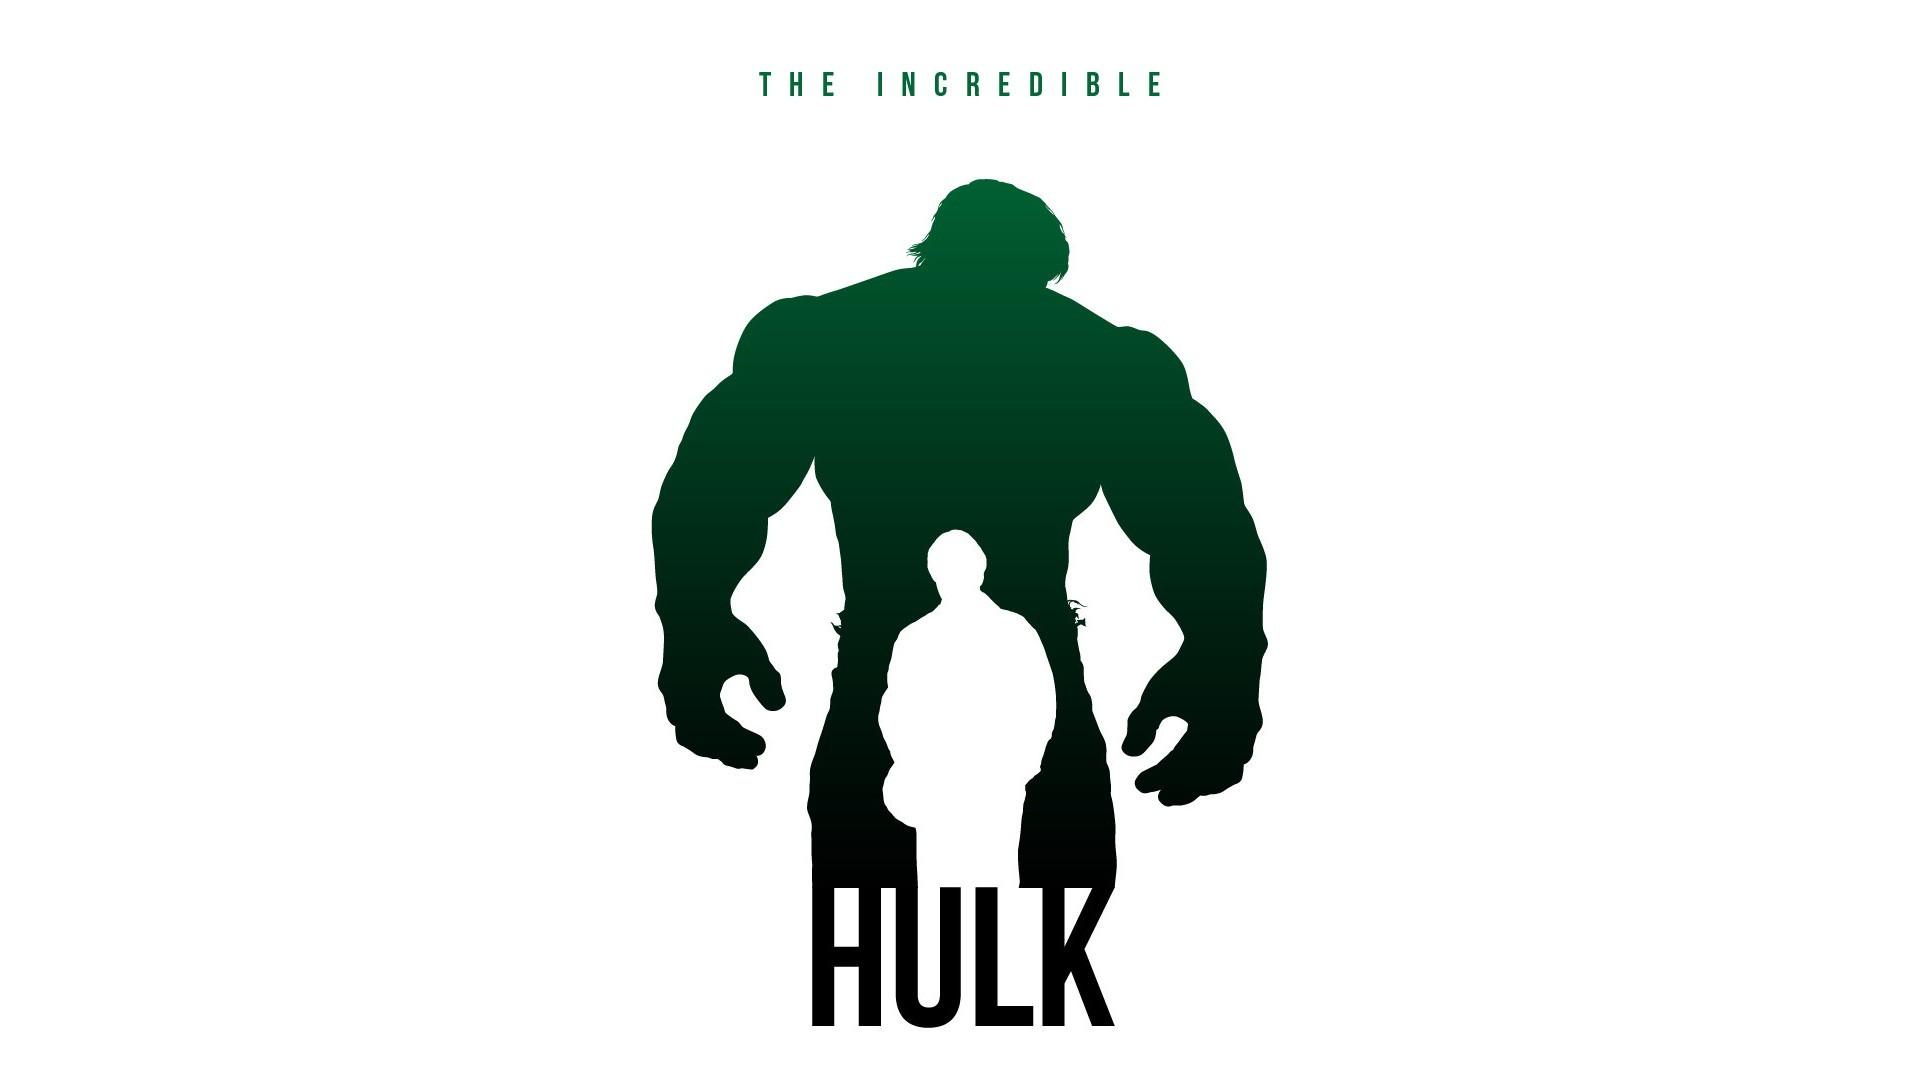 1920x1080 Wallpaper Illustration, Silhouette, Text, Logo, Hulk,